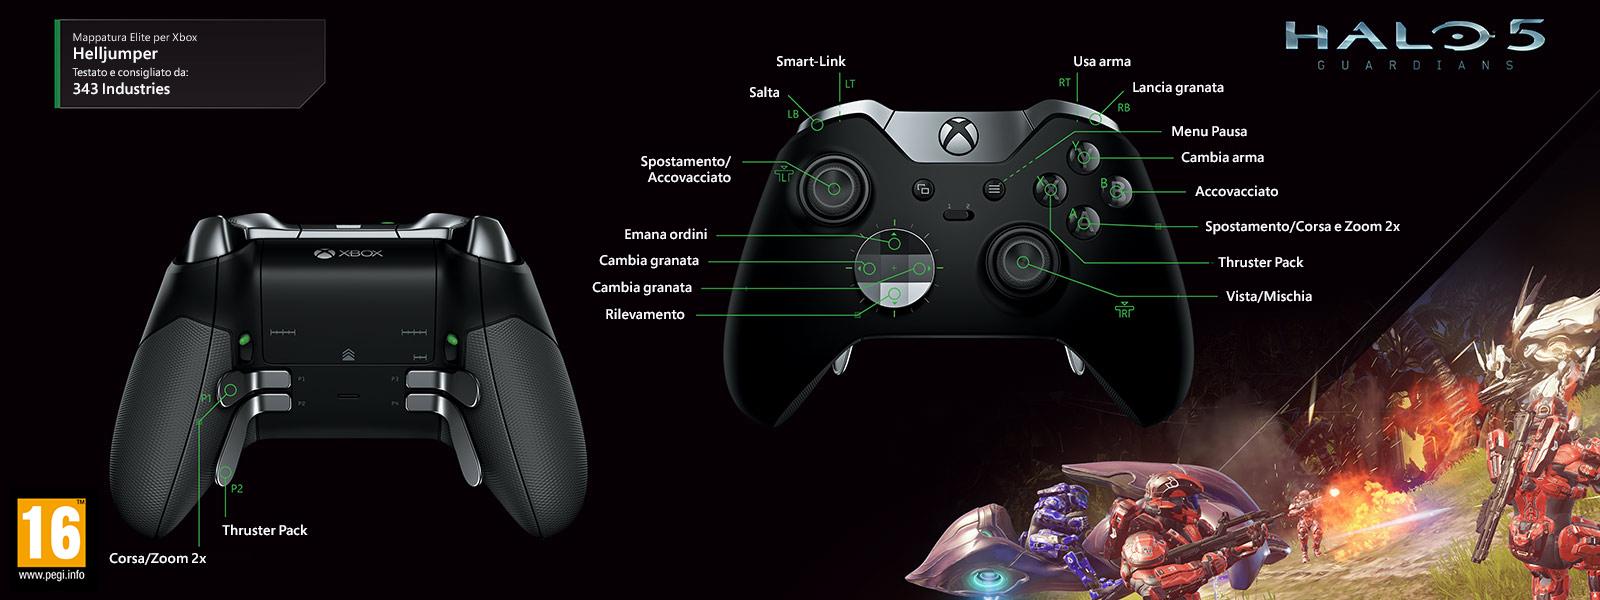 Halo 5 – Mappatura Elite per Helljumper